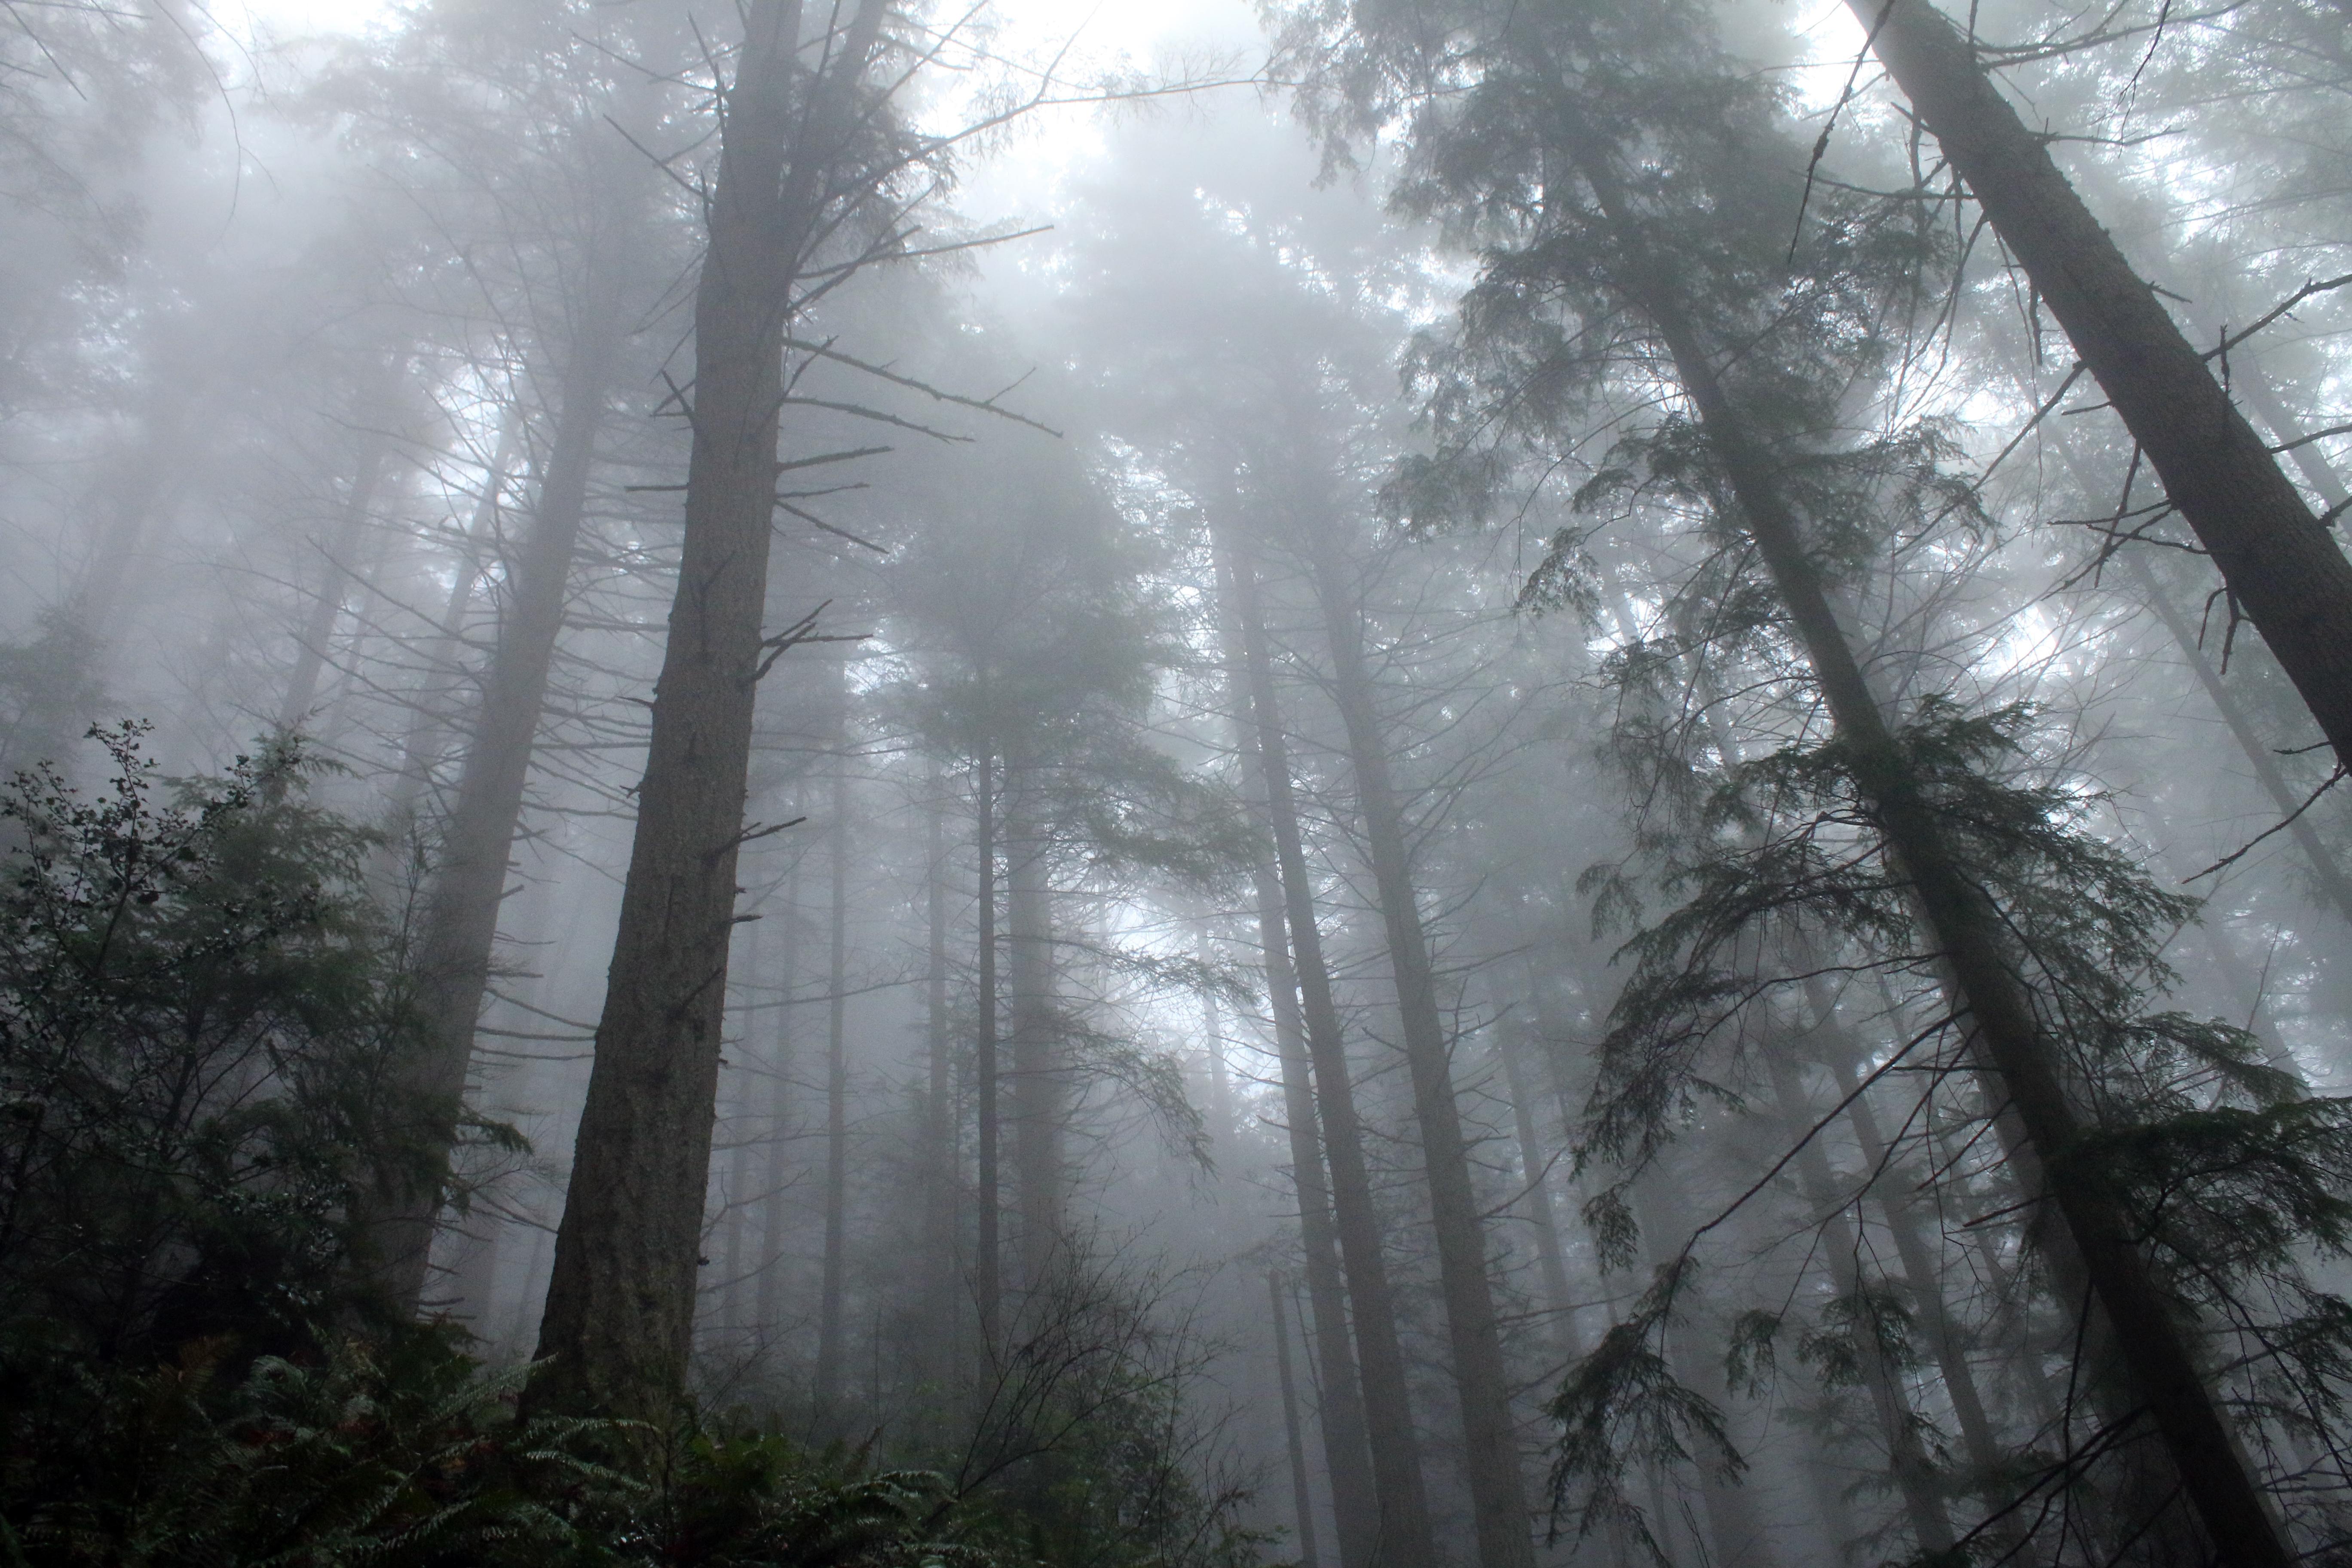 Liminal Seattle maps the Northwest's strange and metaphysical happenings